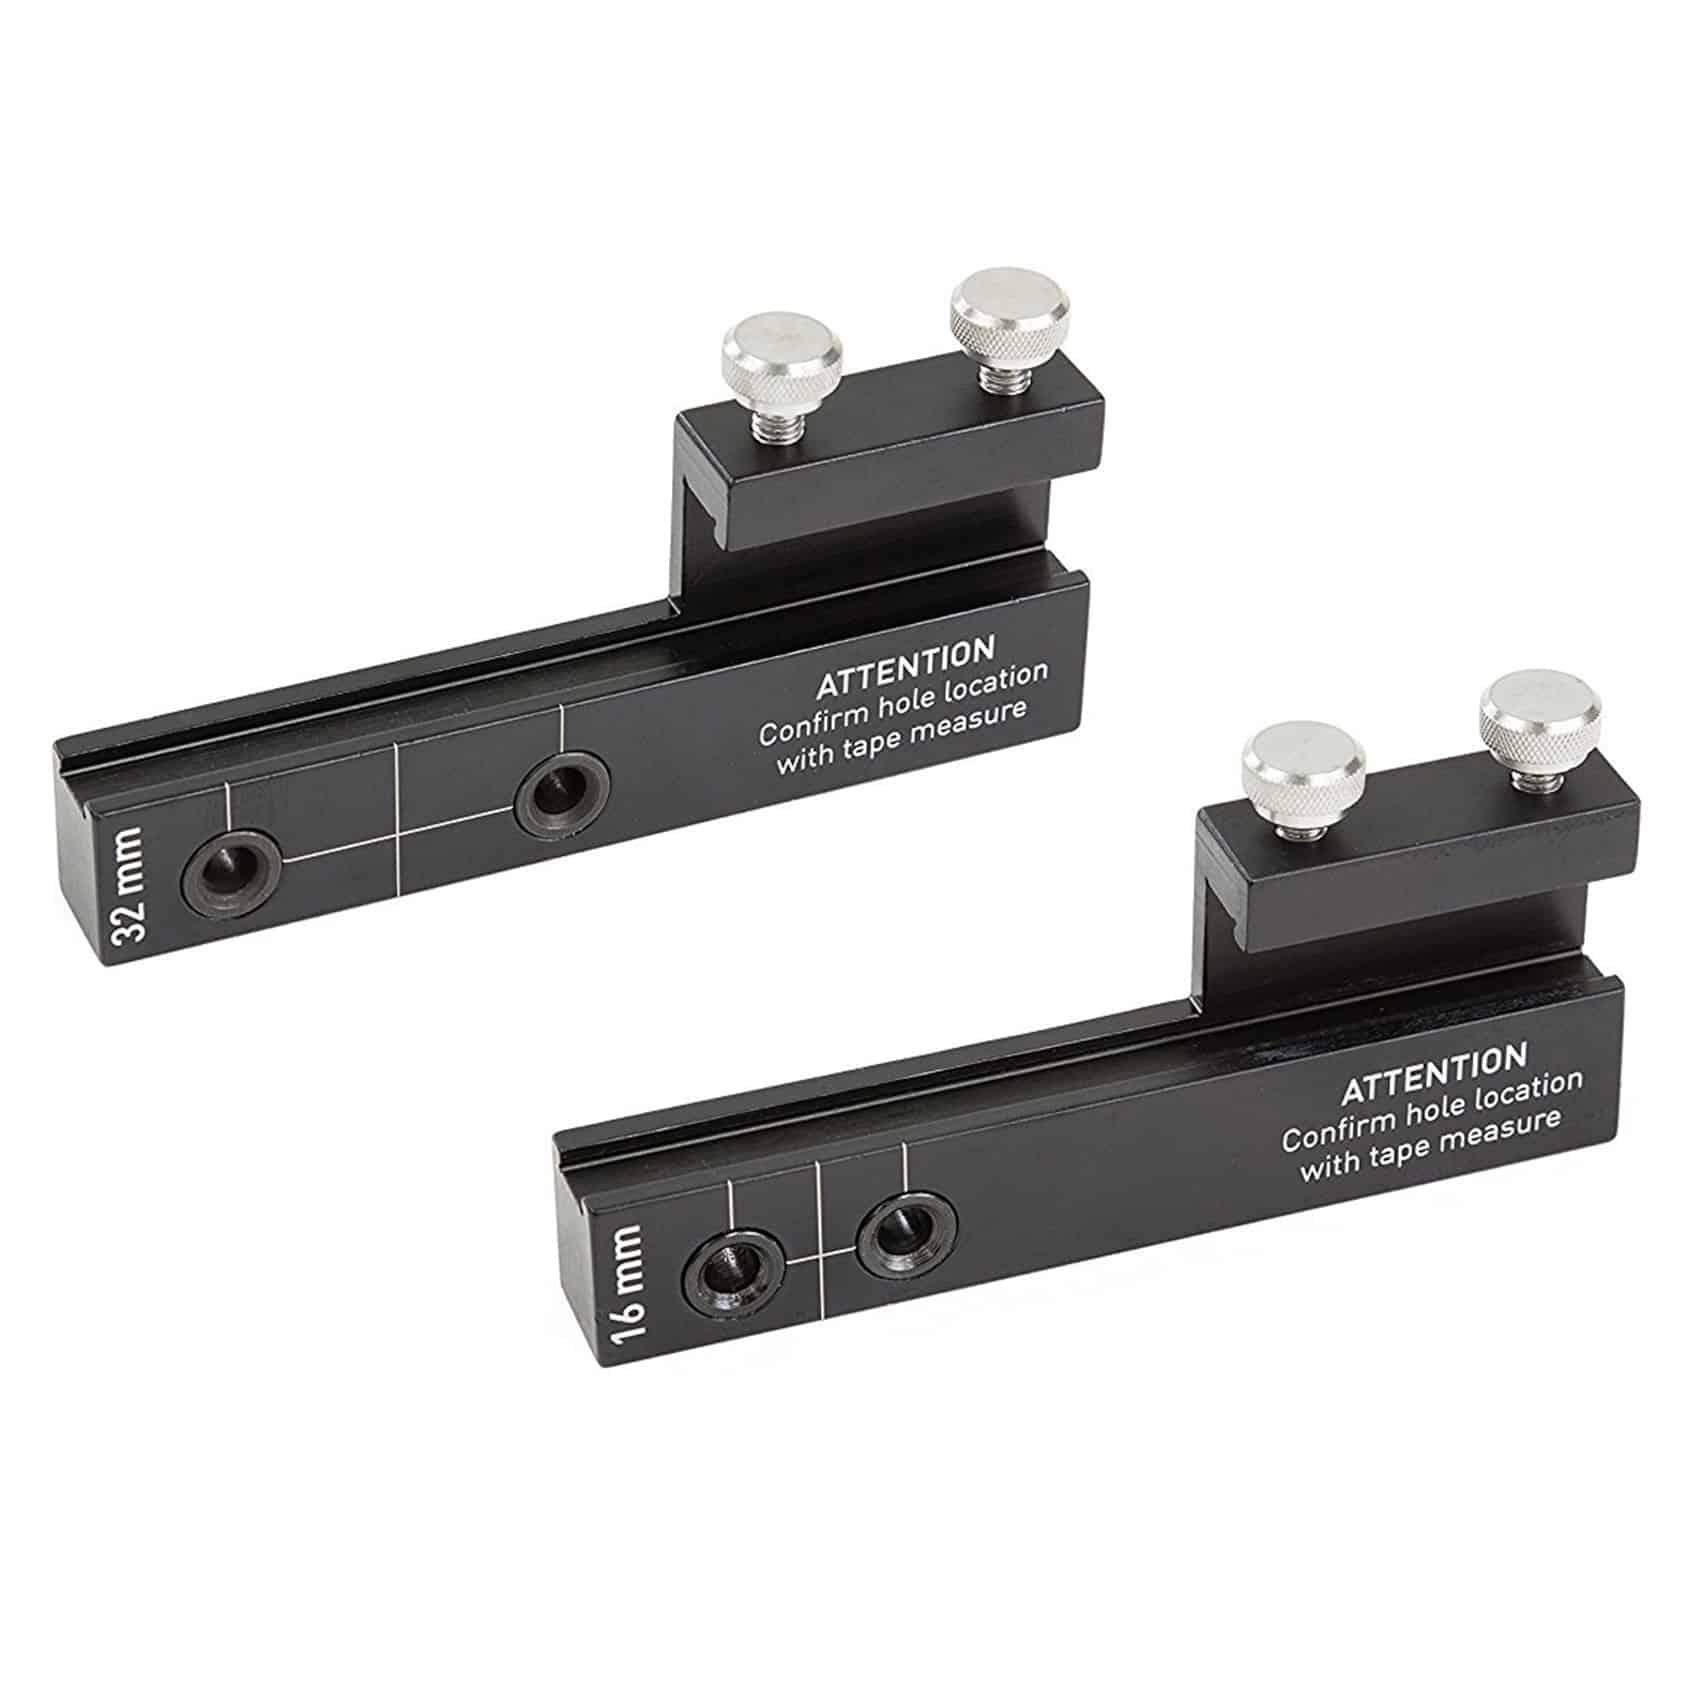 TP-SDG1632 - 16mm 32mm CC Hardware Installation Set